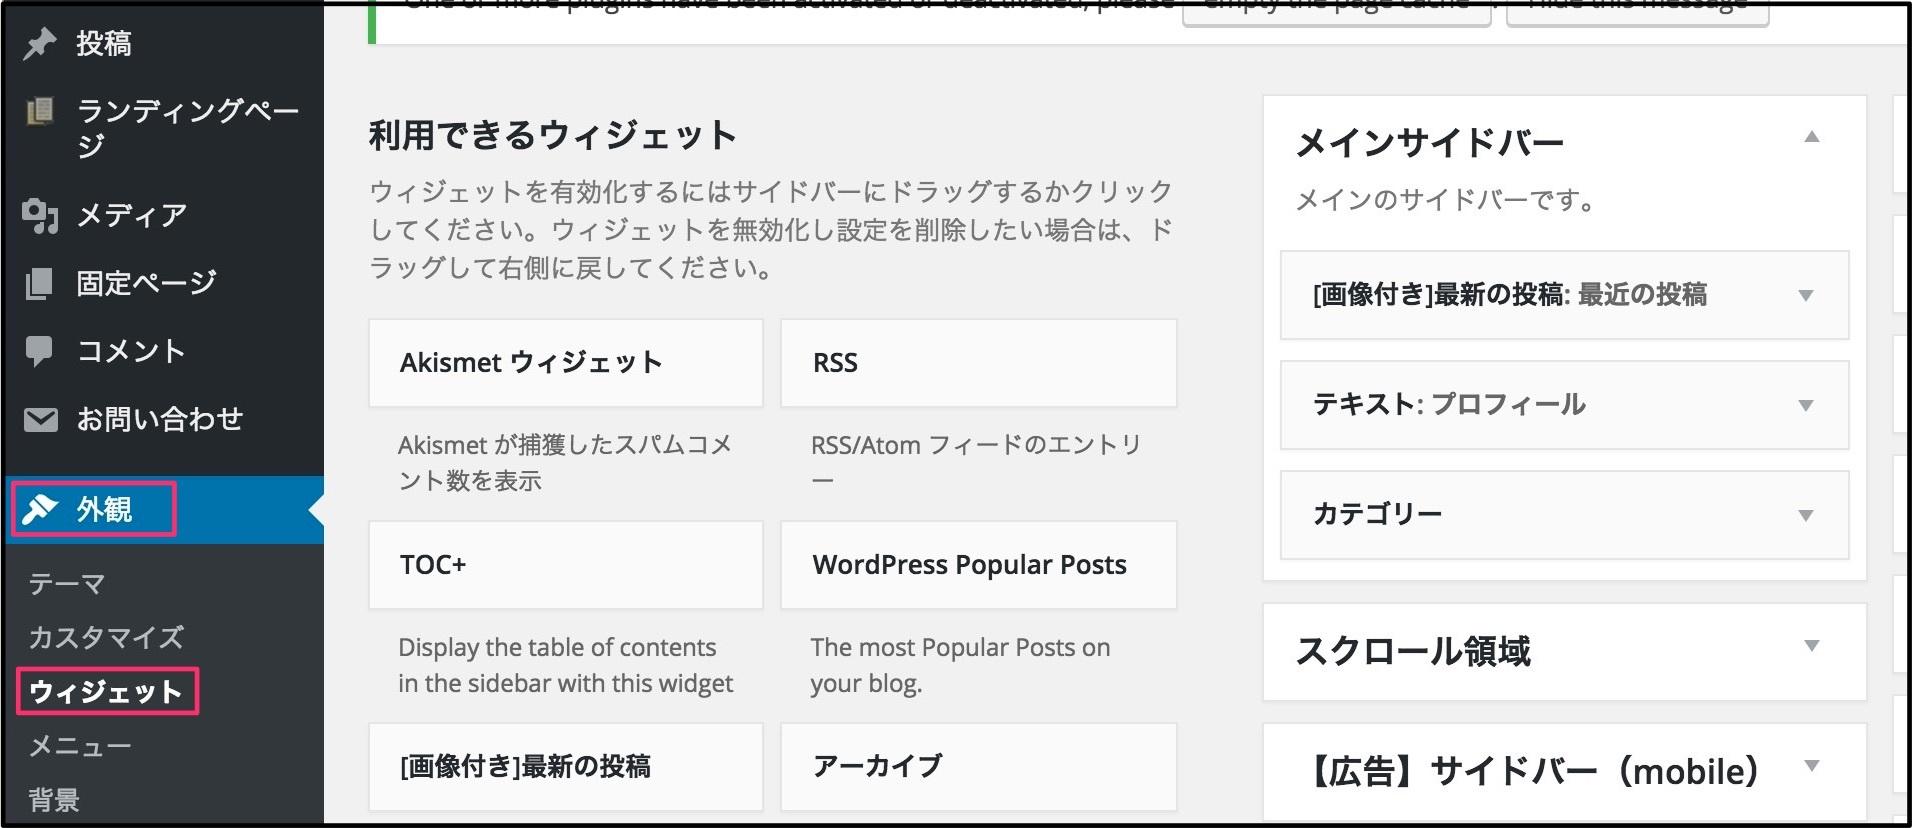 wordpress popular post4